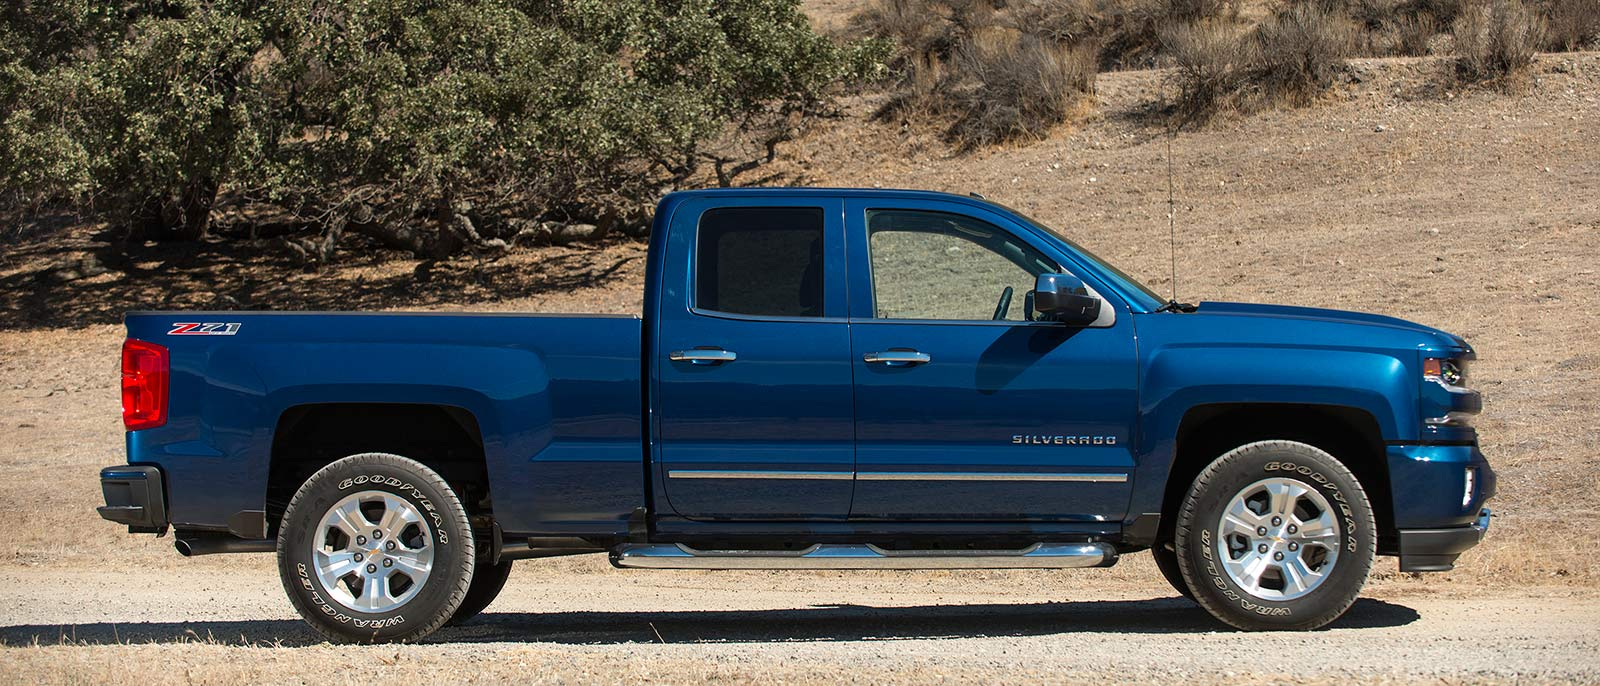 2017 chevrolet silverado 1500 full size pickup truck. Black Bedroom Furniture Sets. Home Design Ideas